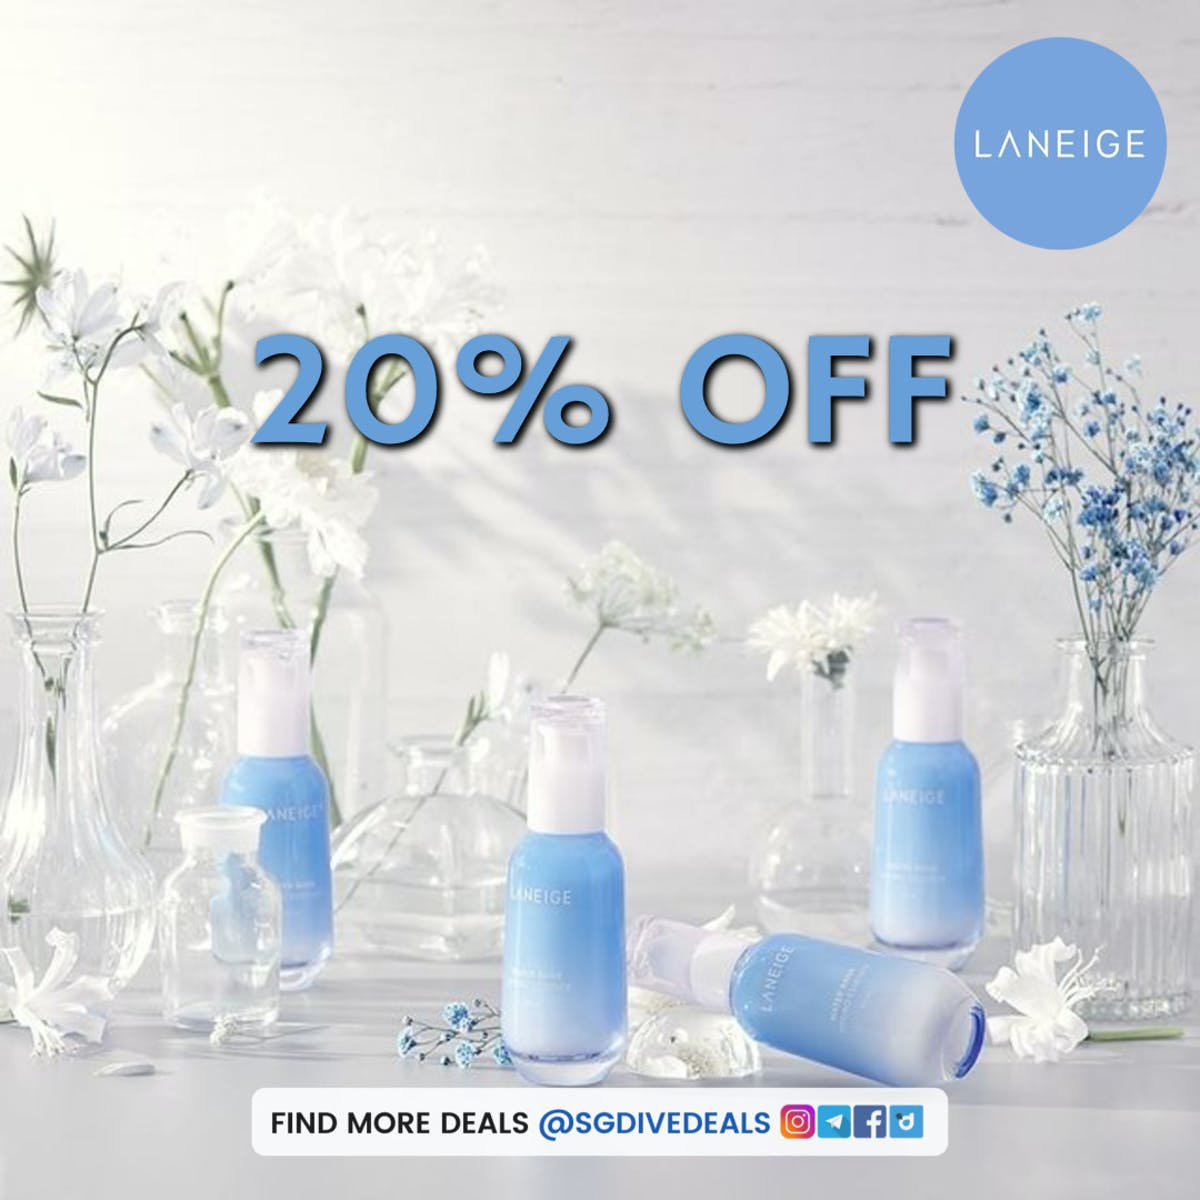 laneige 20% off discounts on korean skincare